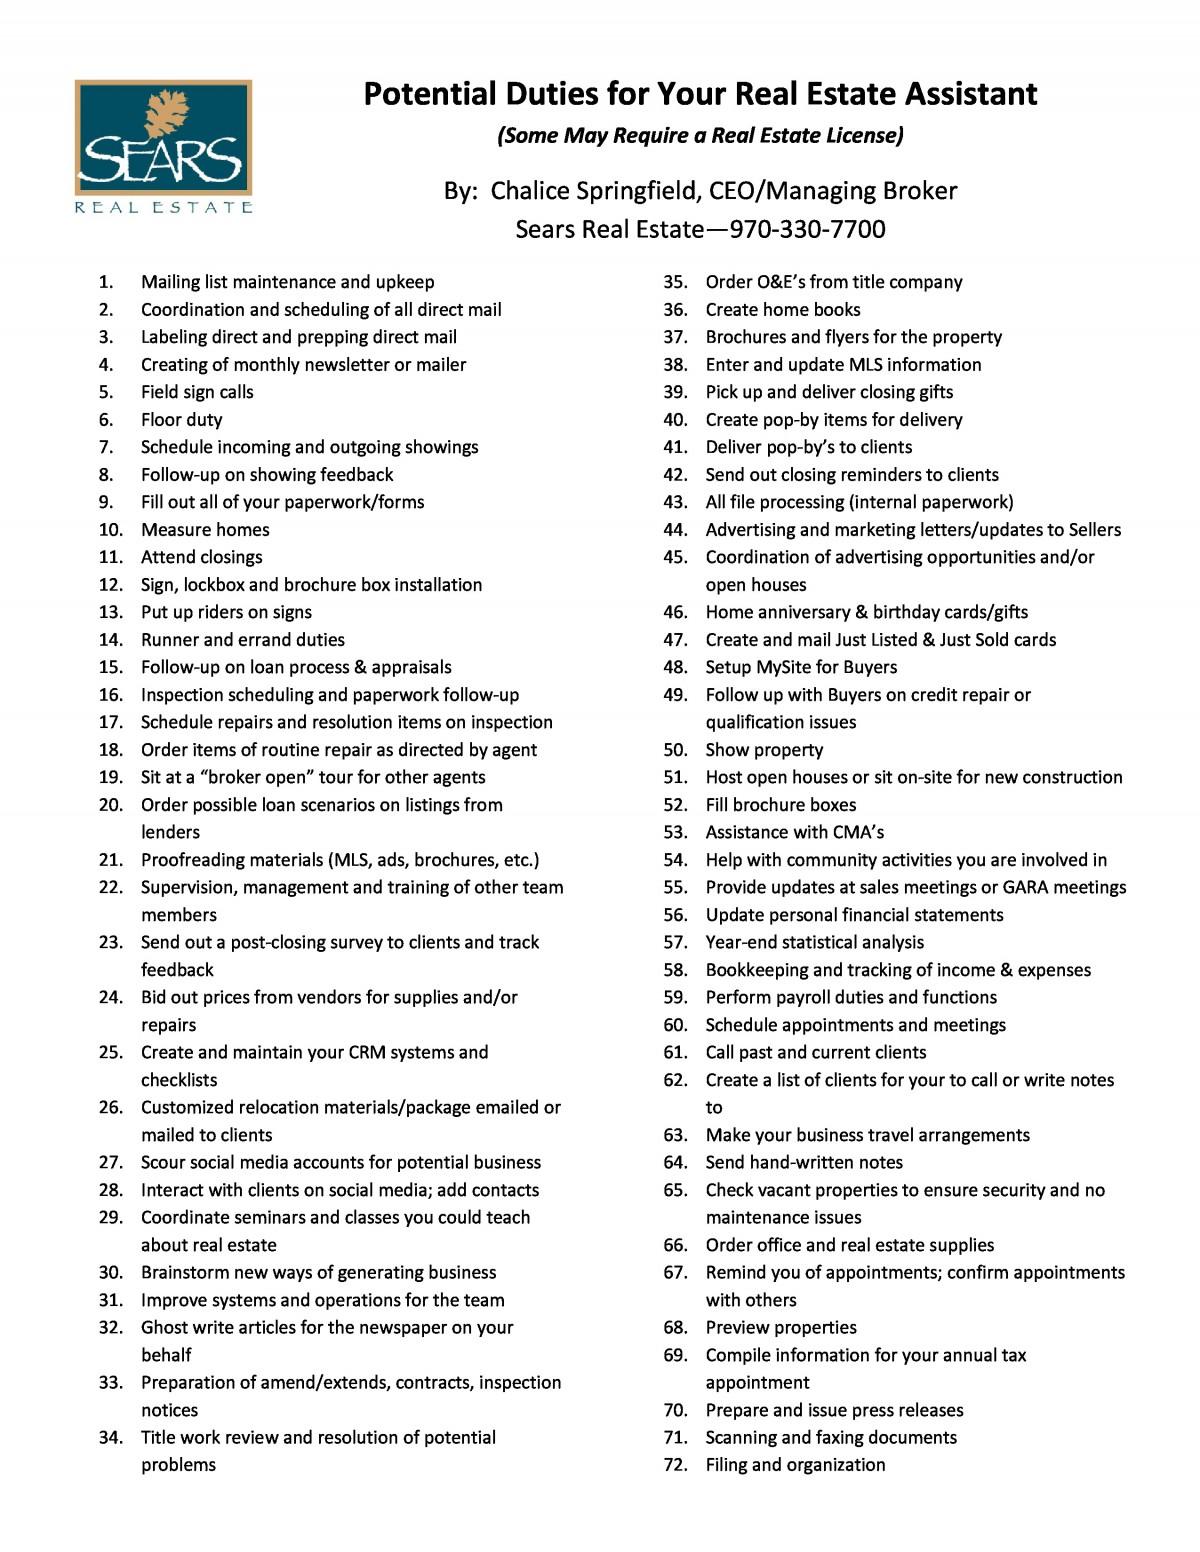 Real Estate Assistant Task Checklist